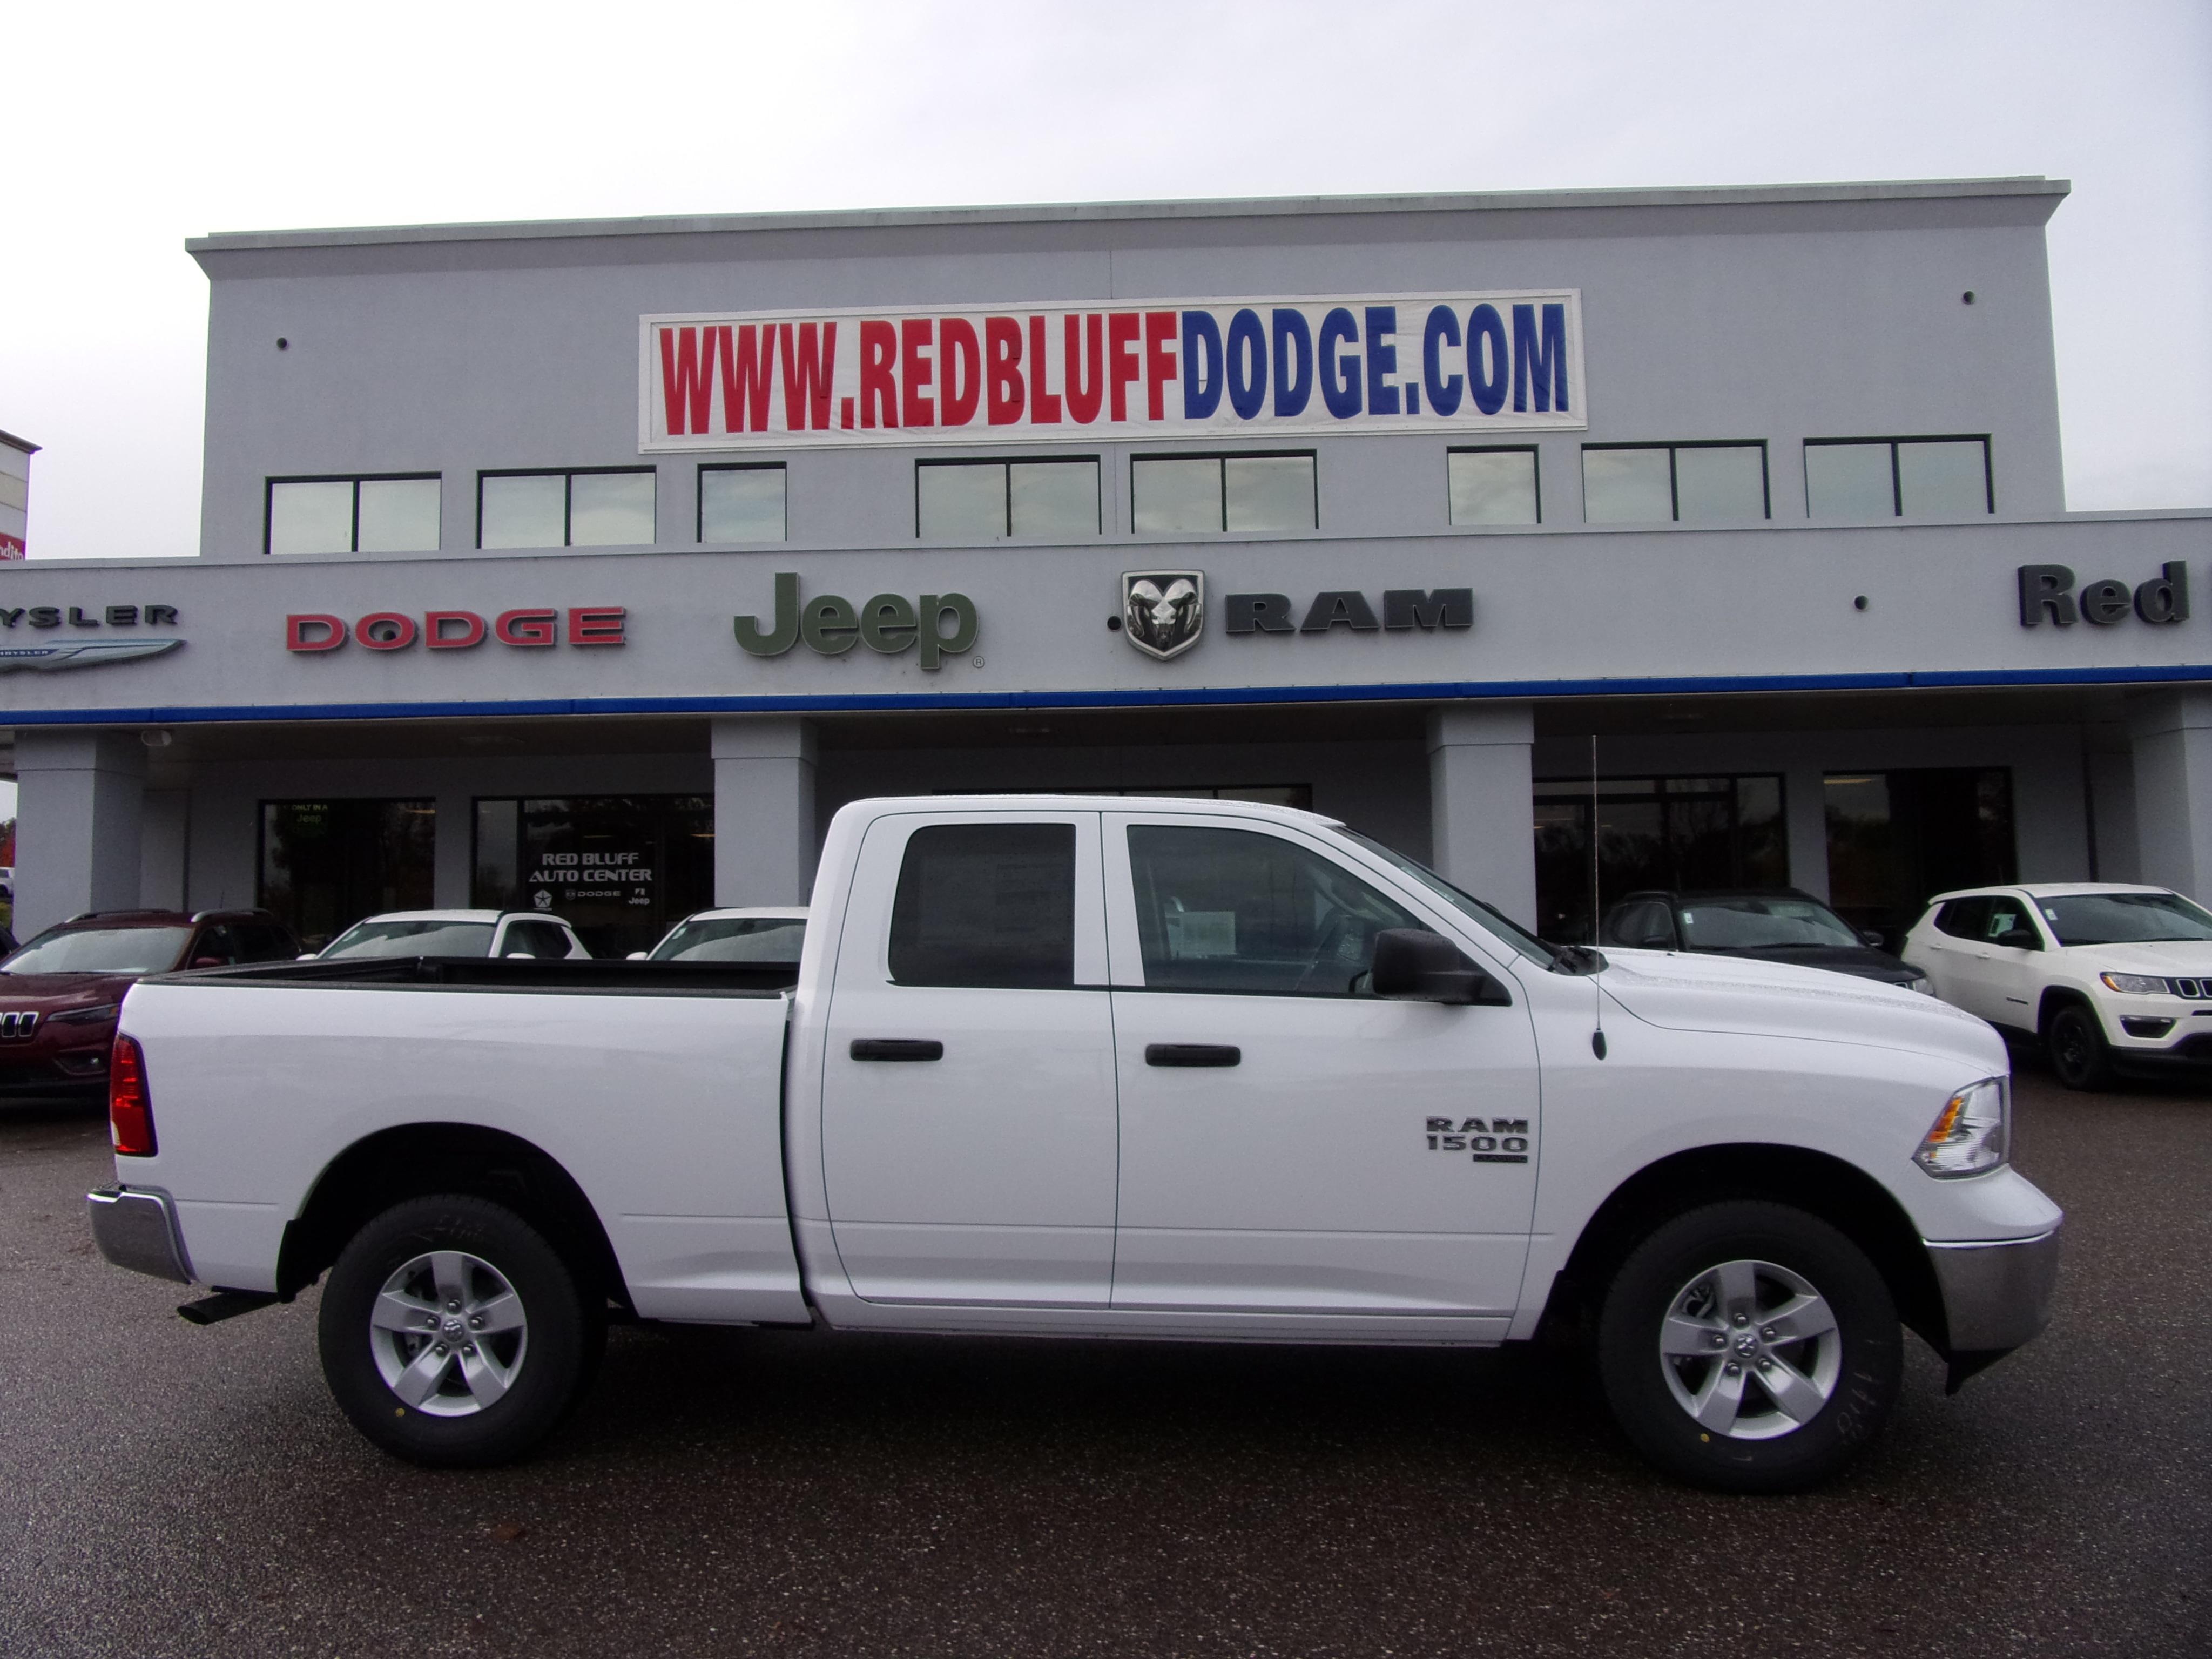 Red Bluff Dodge >> New 2019 Ram 1500 Classic Tradesman Quad Cab 4x4 6 4 Box Quad Cab In Red Bluff Near Chico Redding Paradise Ca Vin 1c6rr7fg0ks558388